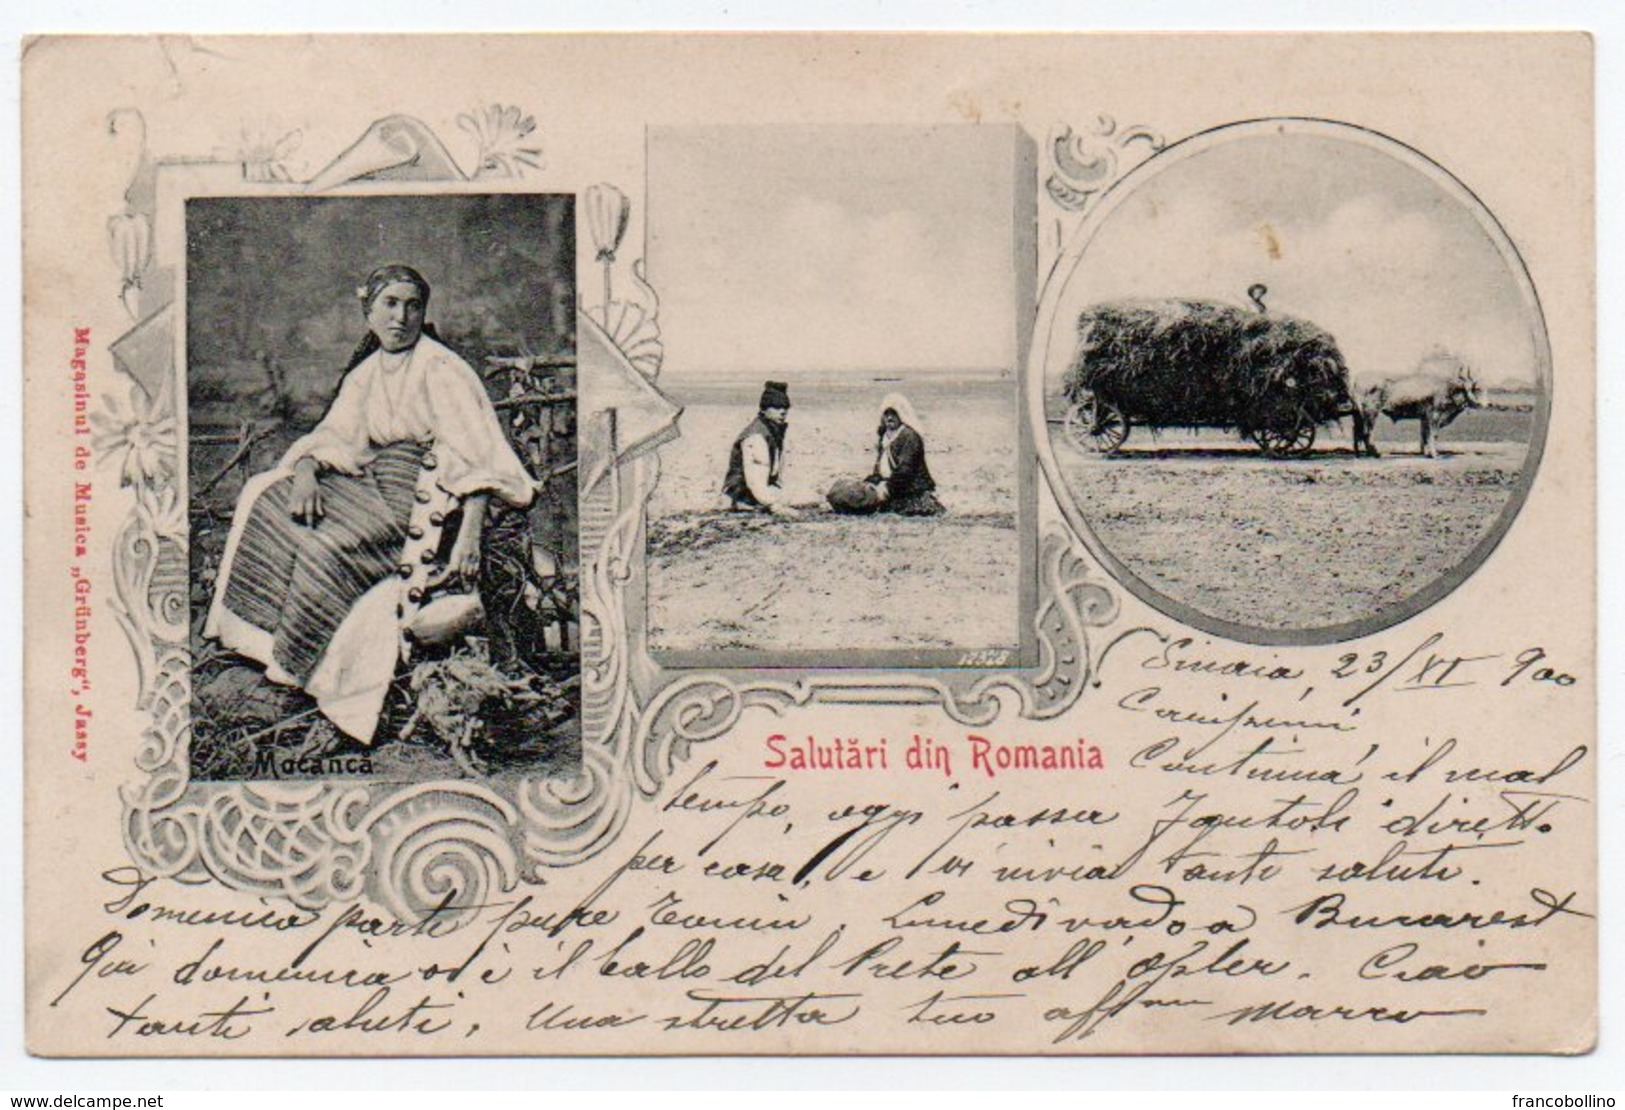 ROMANIA/ROUMANIE - SALUTARI DIN ROMANIA - 1900 - Romania